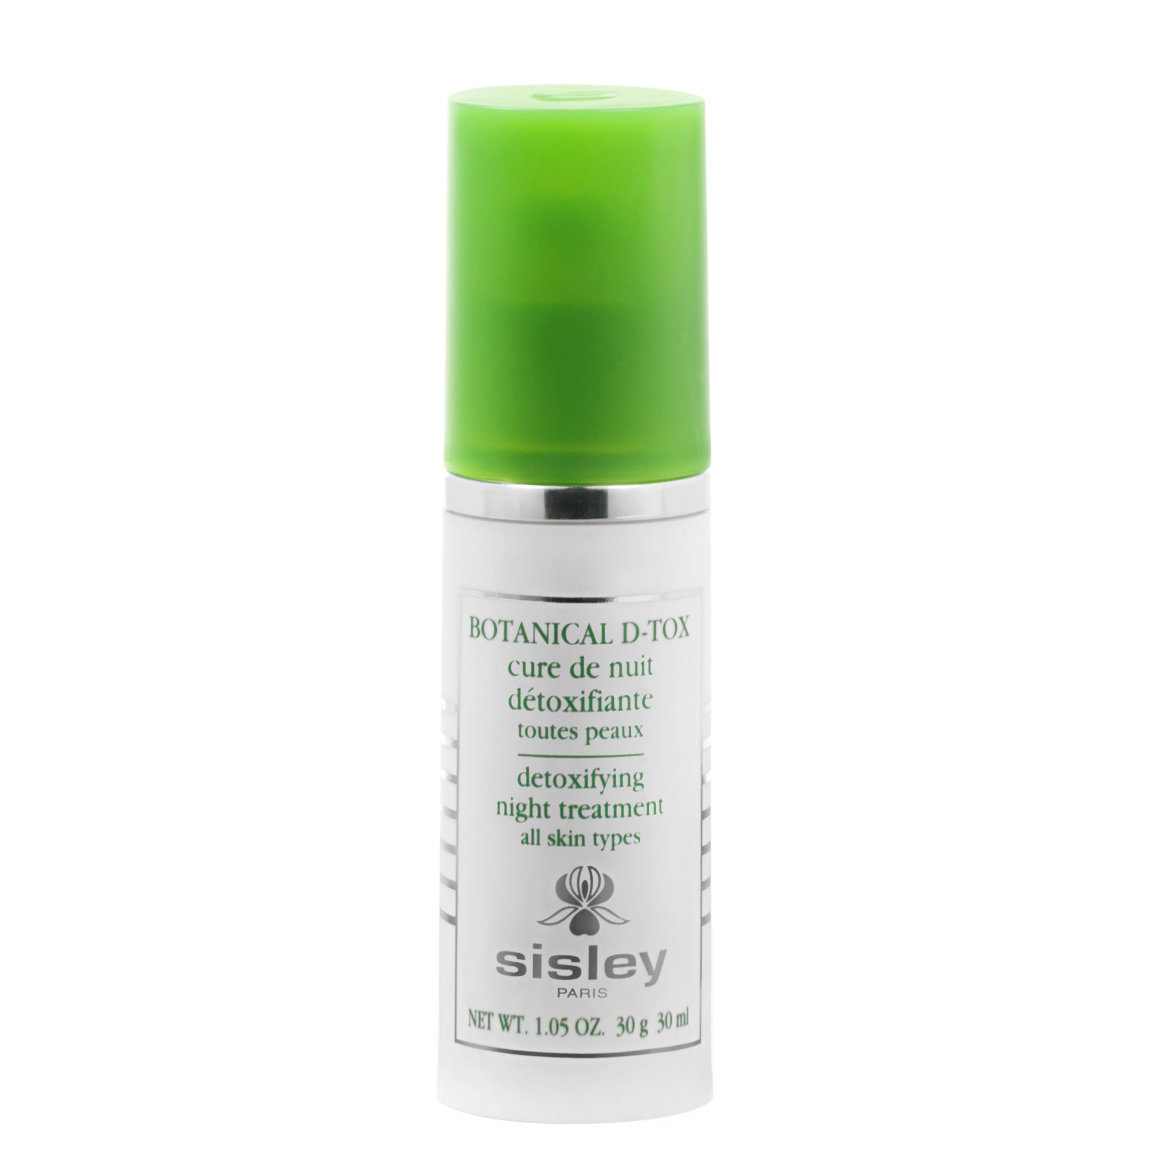 Sisley-Paris Botanical D-Tox Detoxifying Night Treatment alternative view 1 - product swatch.